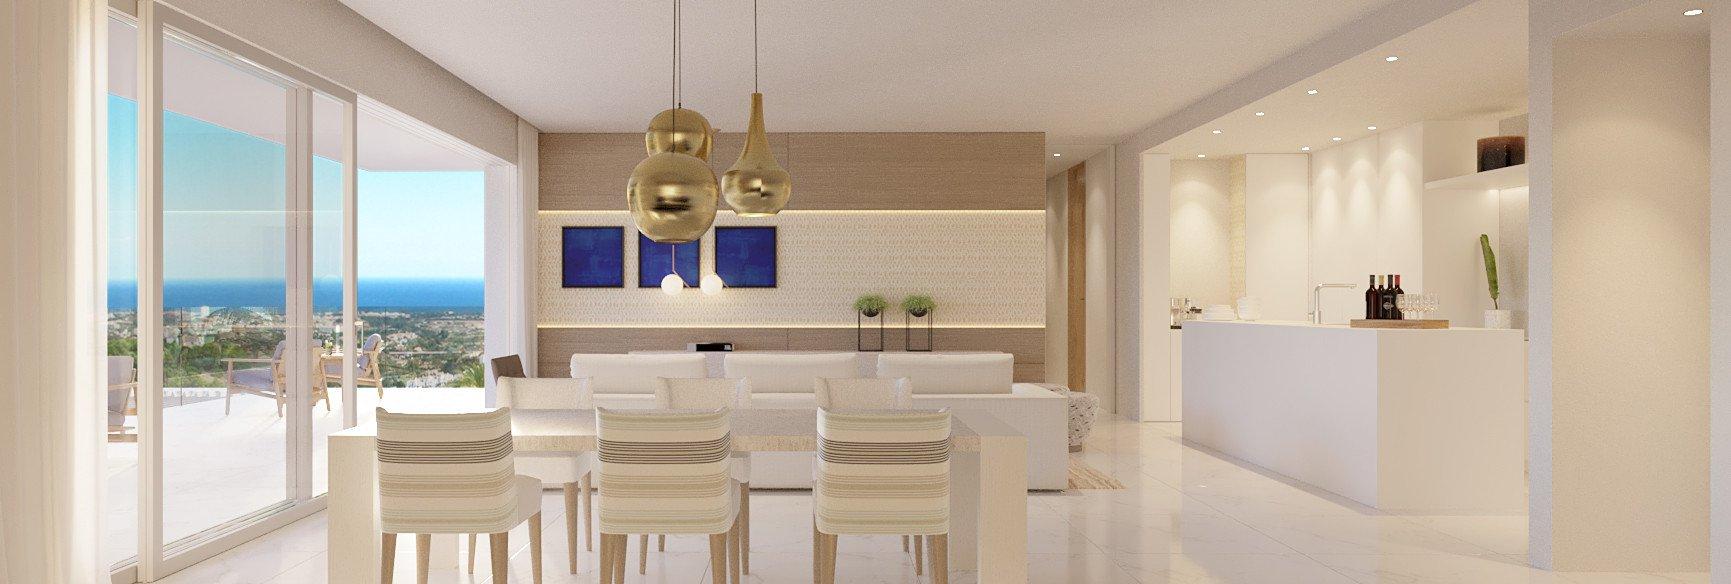 Nieuwbouwproject Benahavis- Marbella